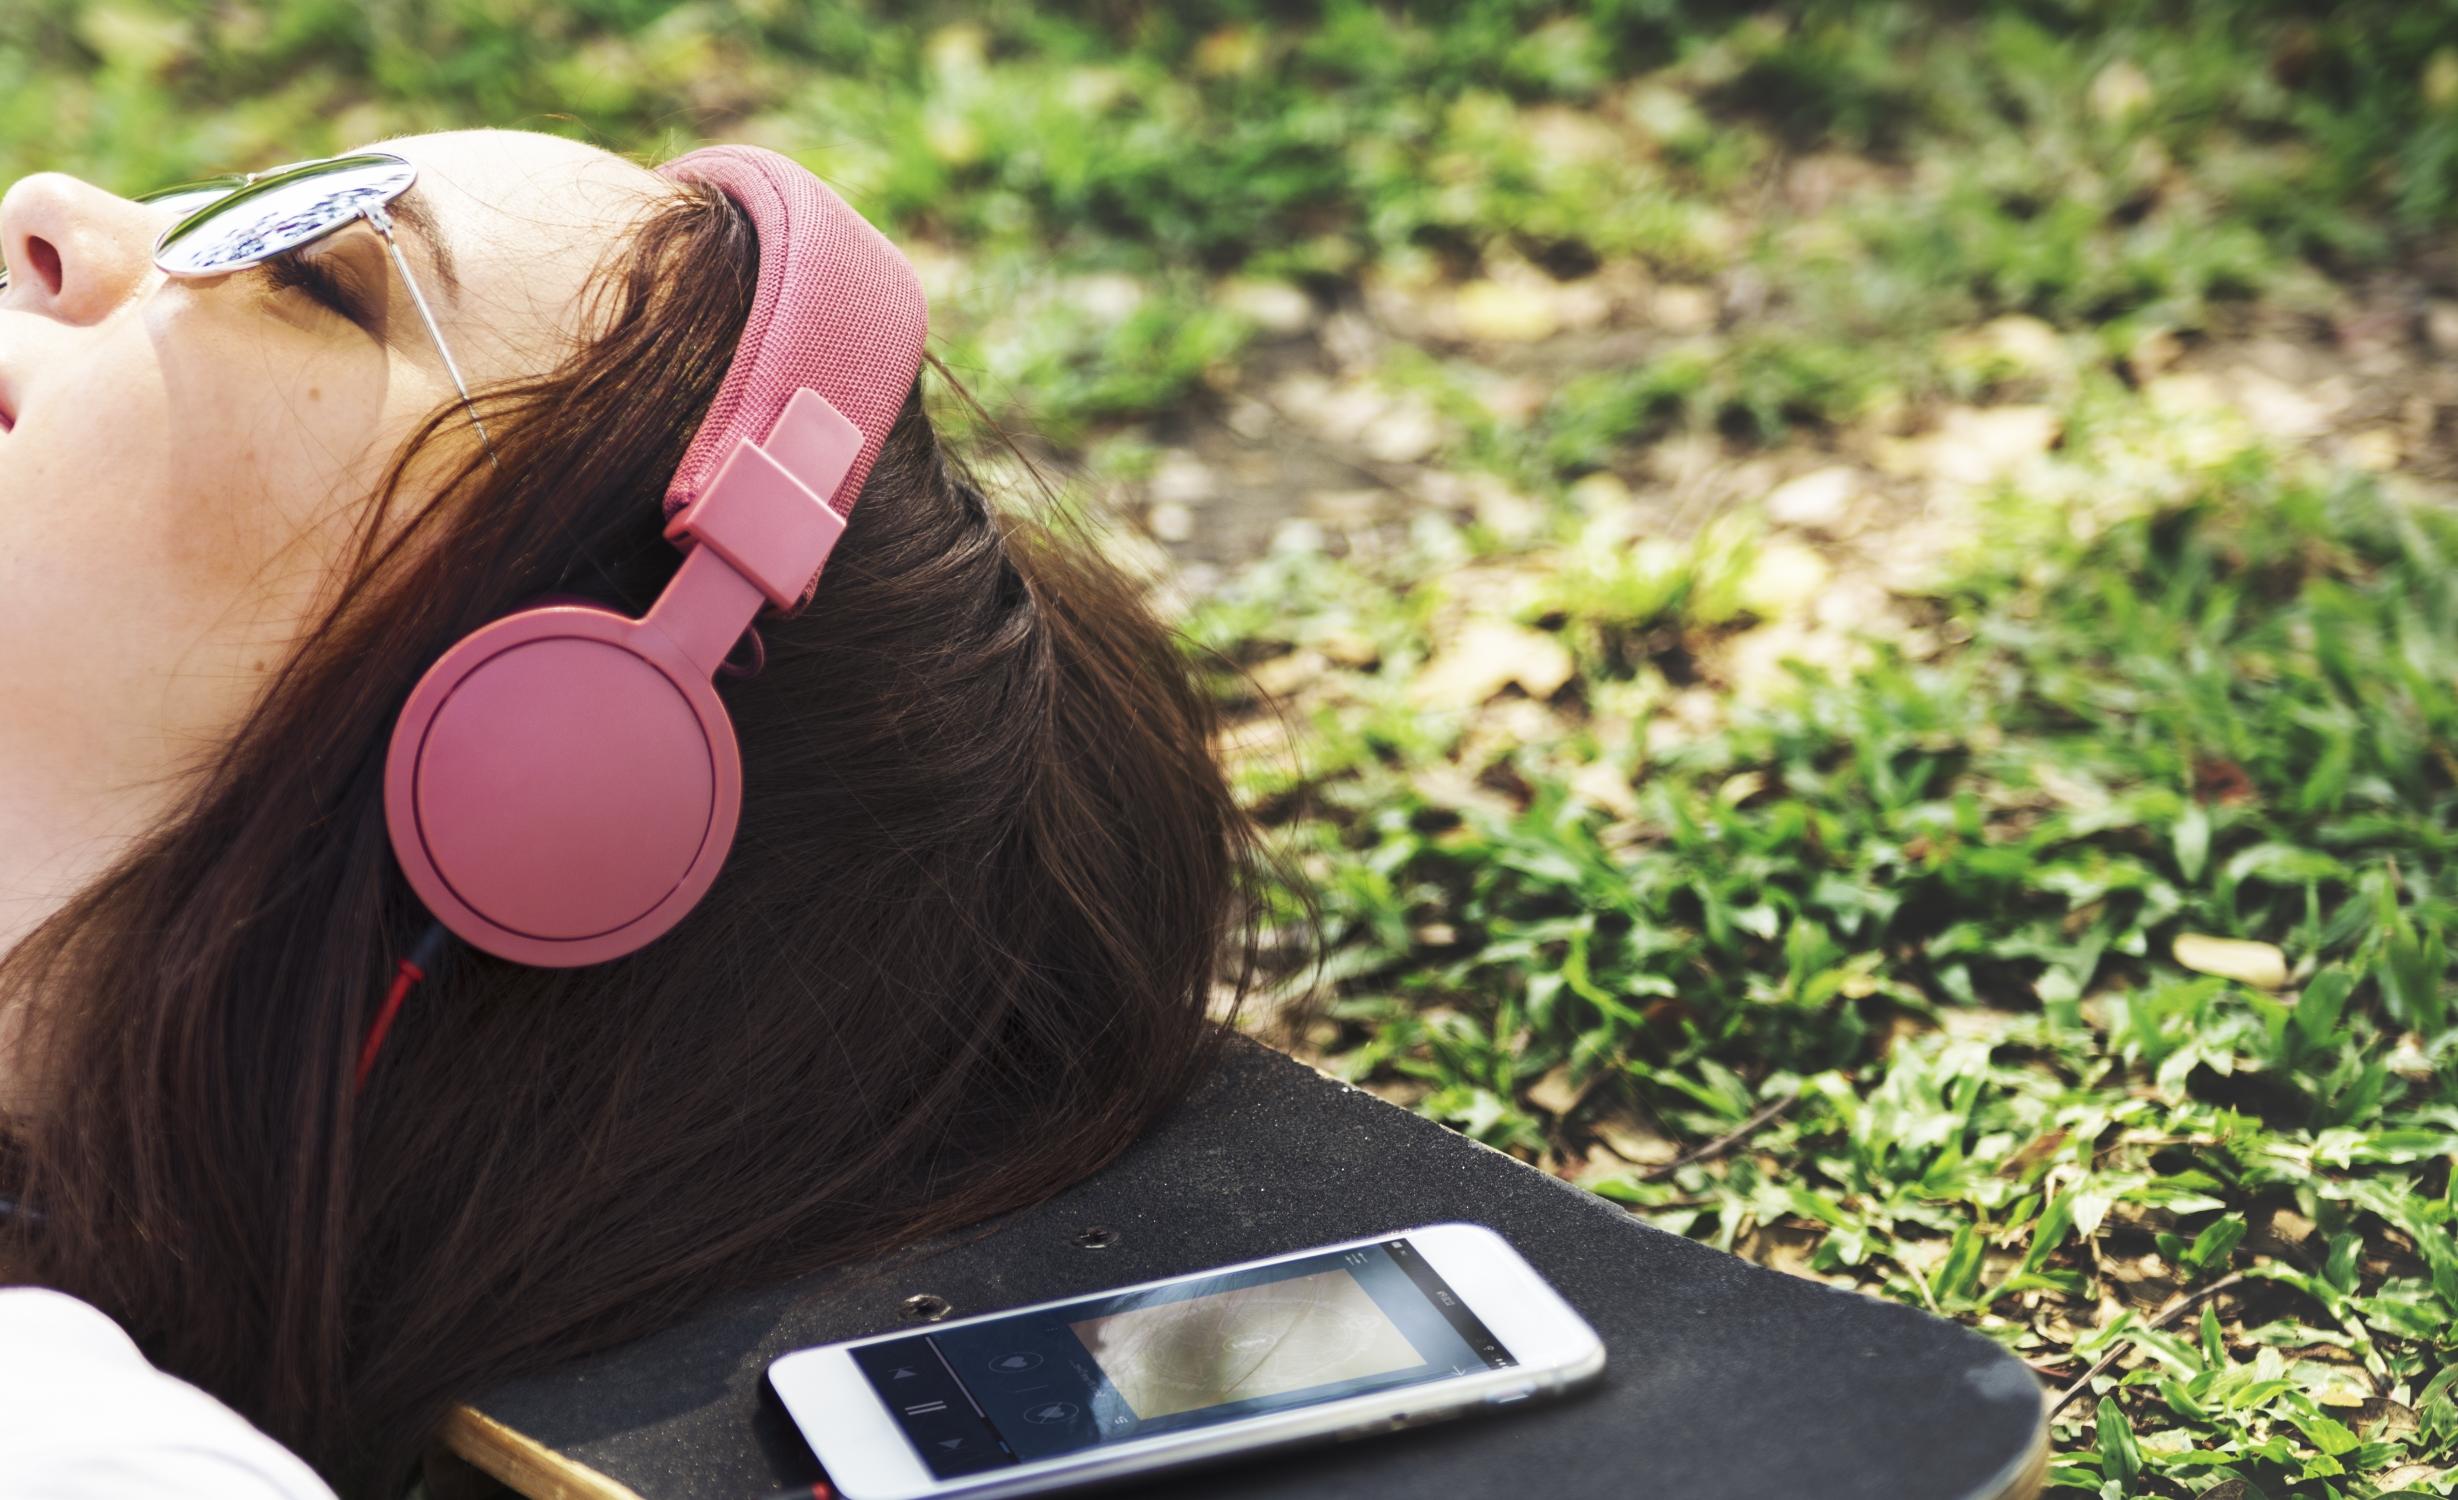 Mädchen hört Musik mit Kopfhörern